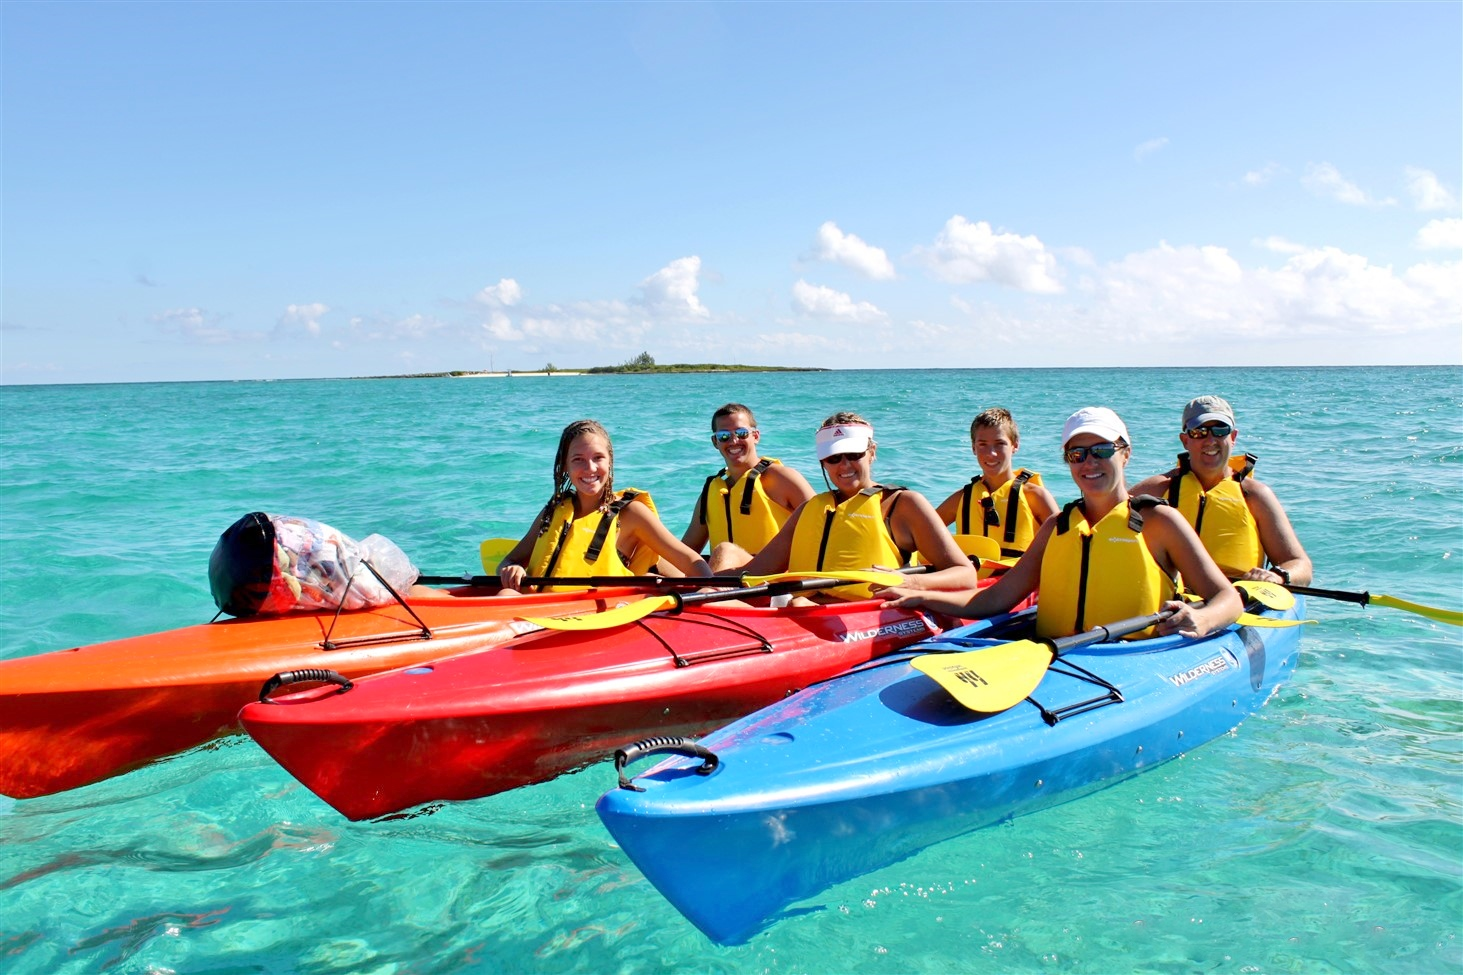 92 Best Celebrity Shore Excursions images in 2019 | Shore ...